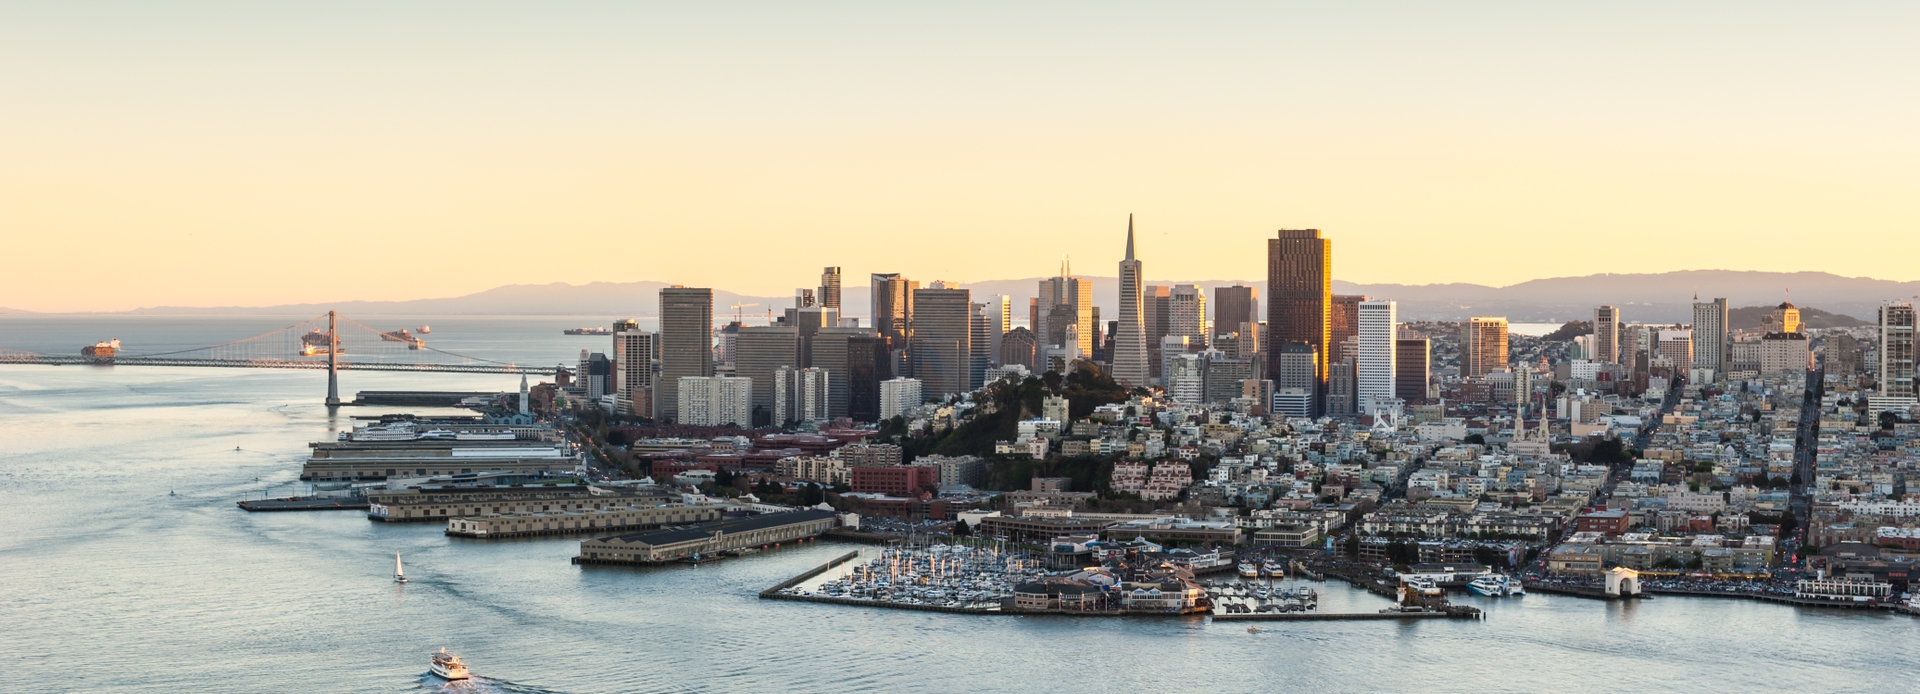 San Francisco CityPASS C3